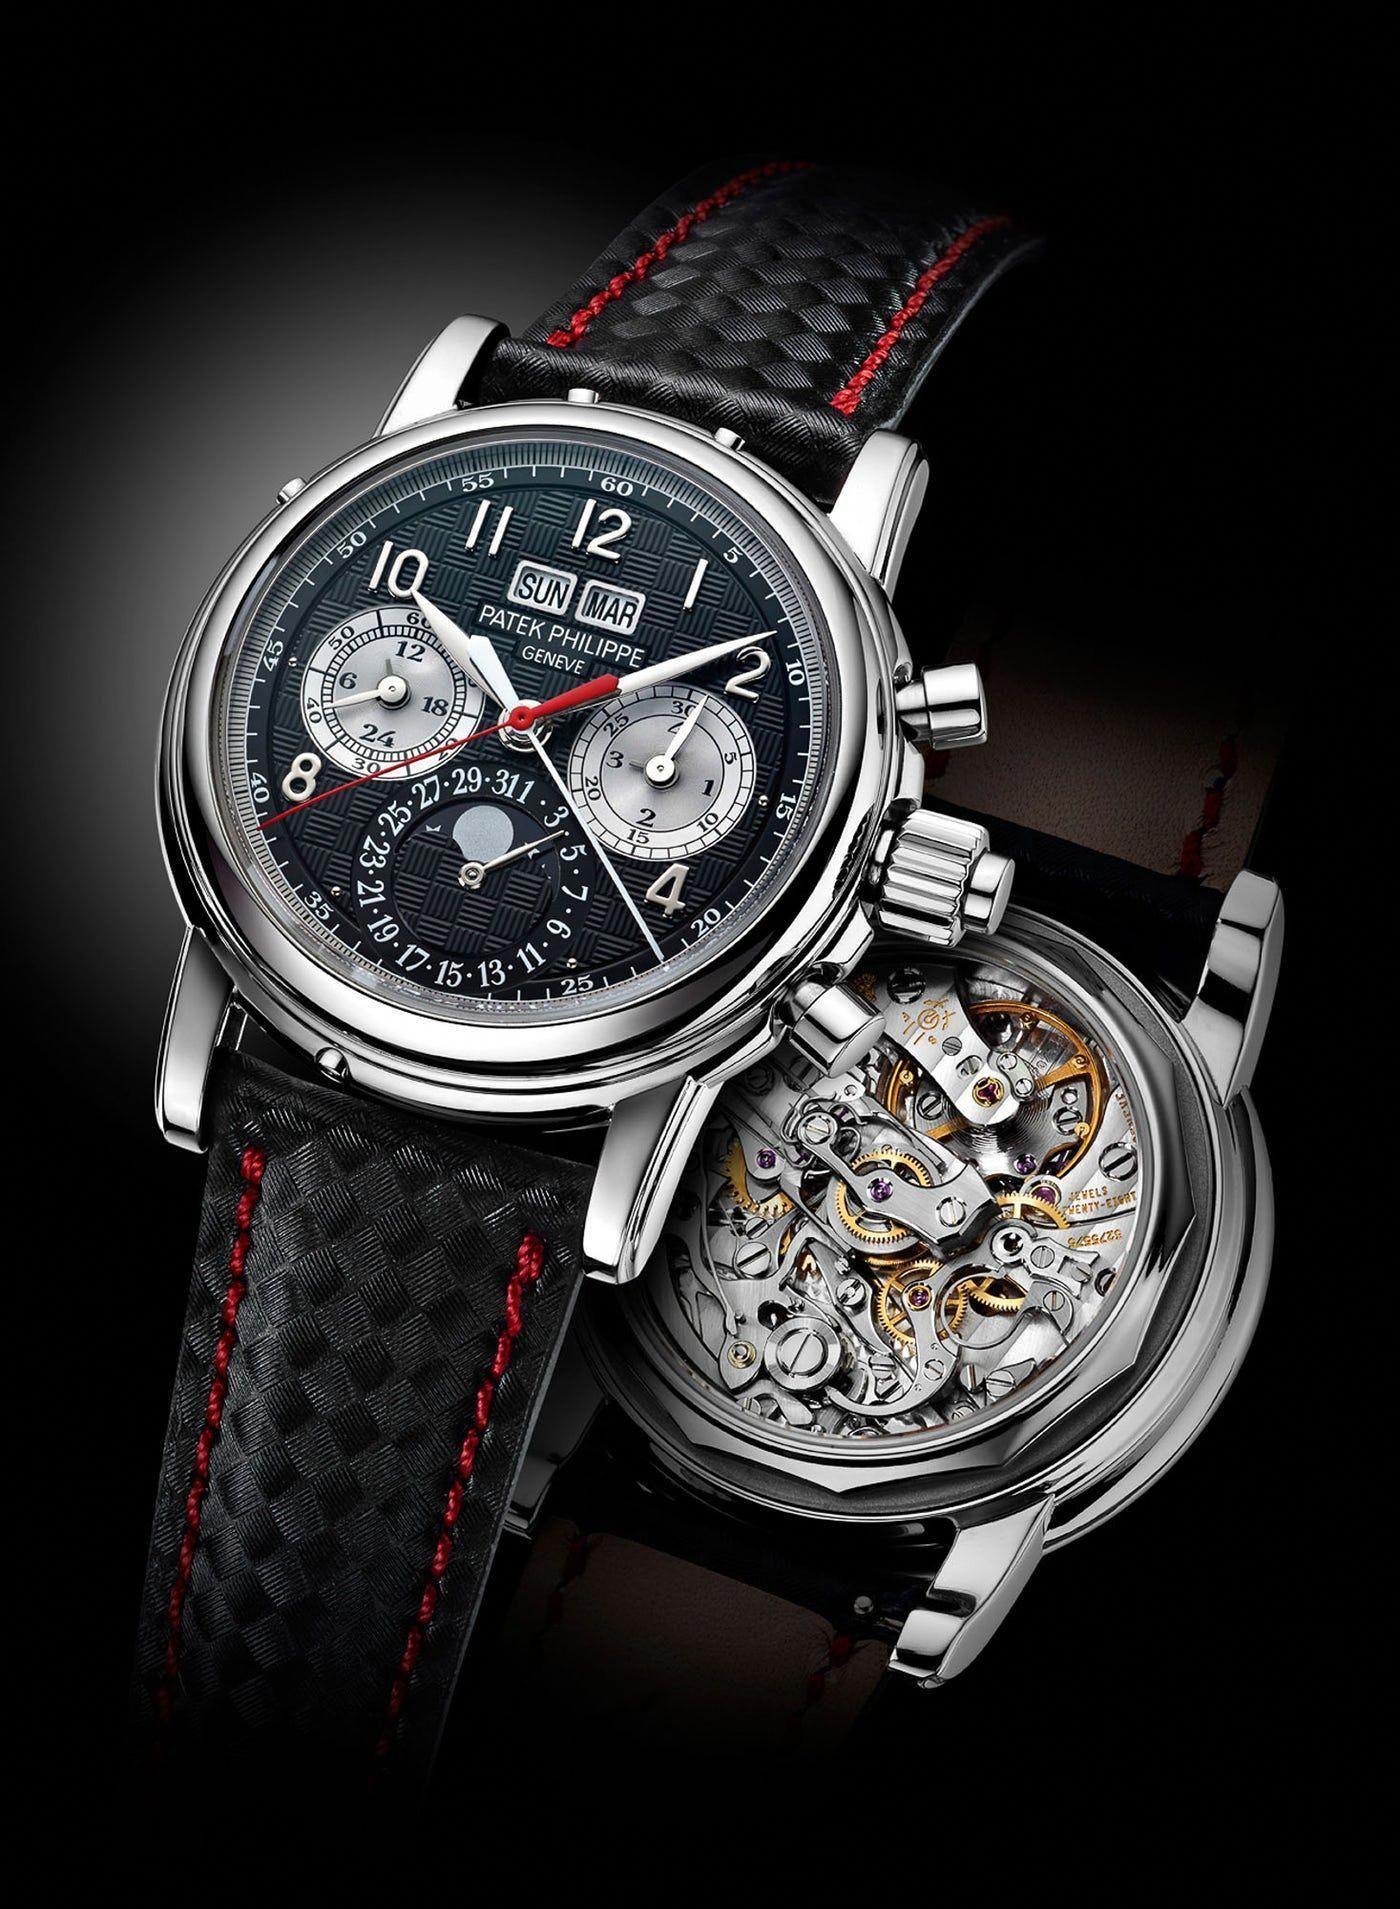 e04b87afb96 Patek Philippe Creates Unique 5004 Split-Seconds Perpetual Calendar In  Titanium For Only Watch 2013  watchUnique